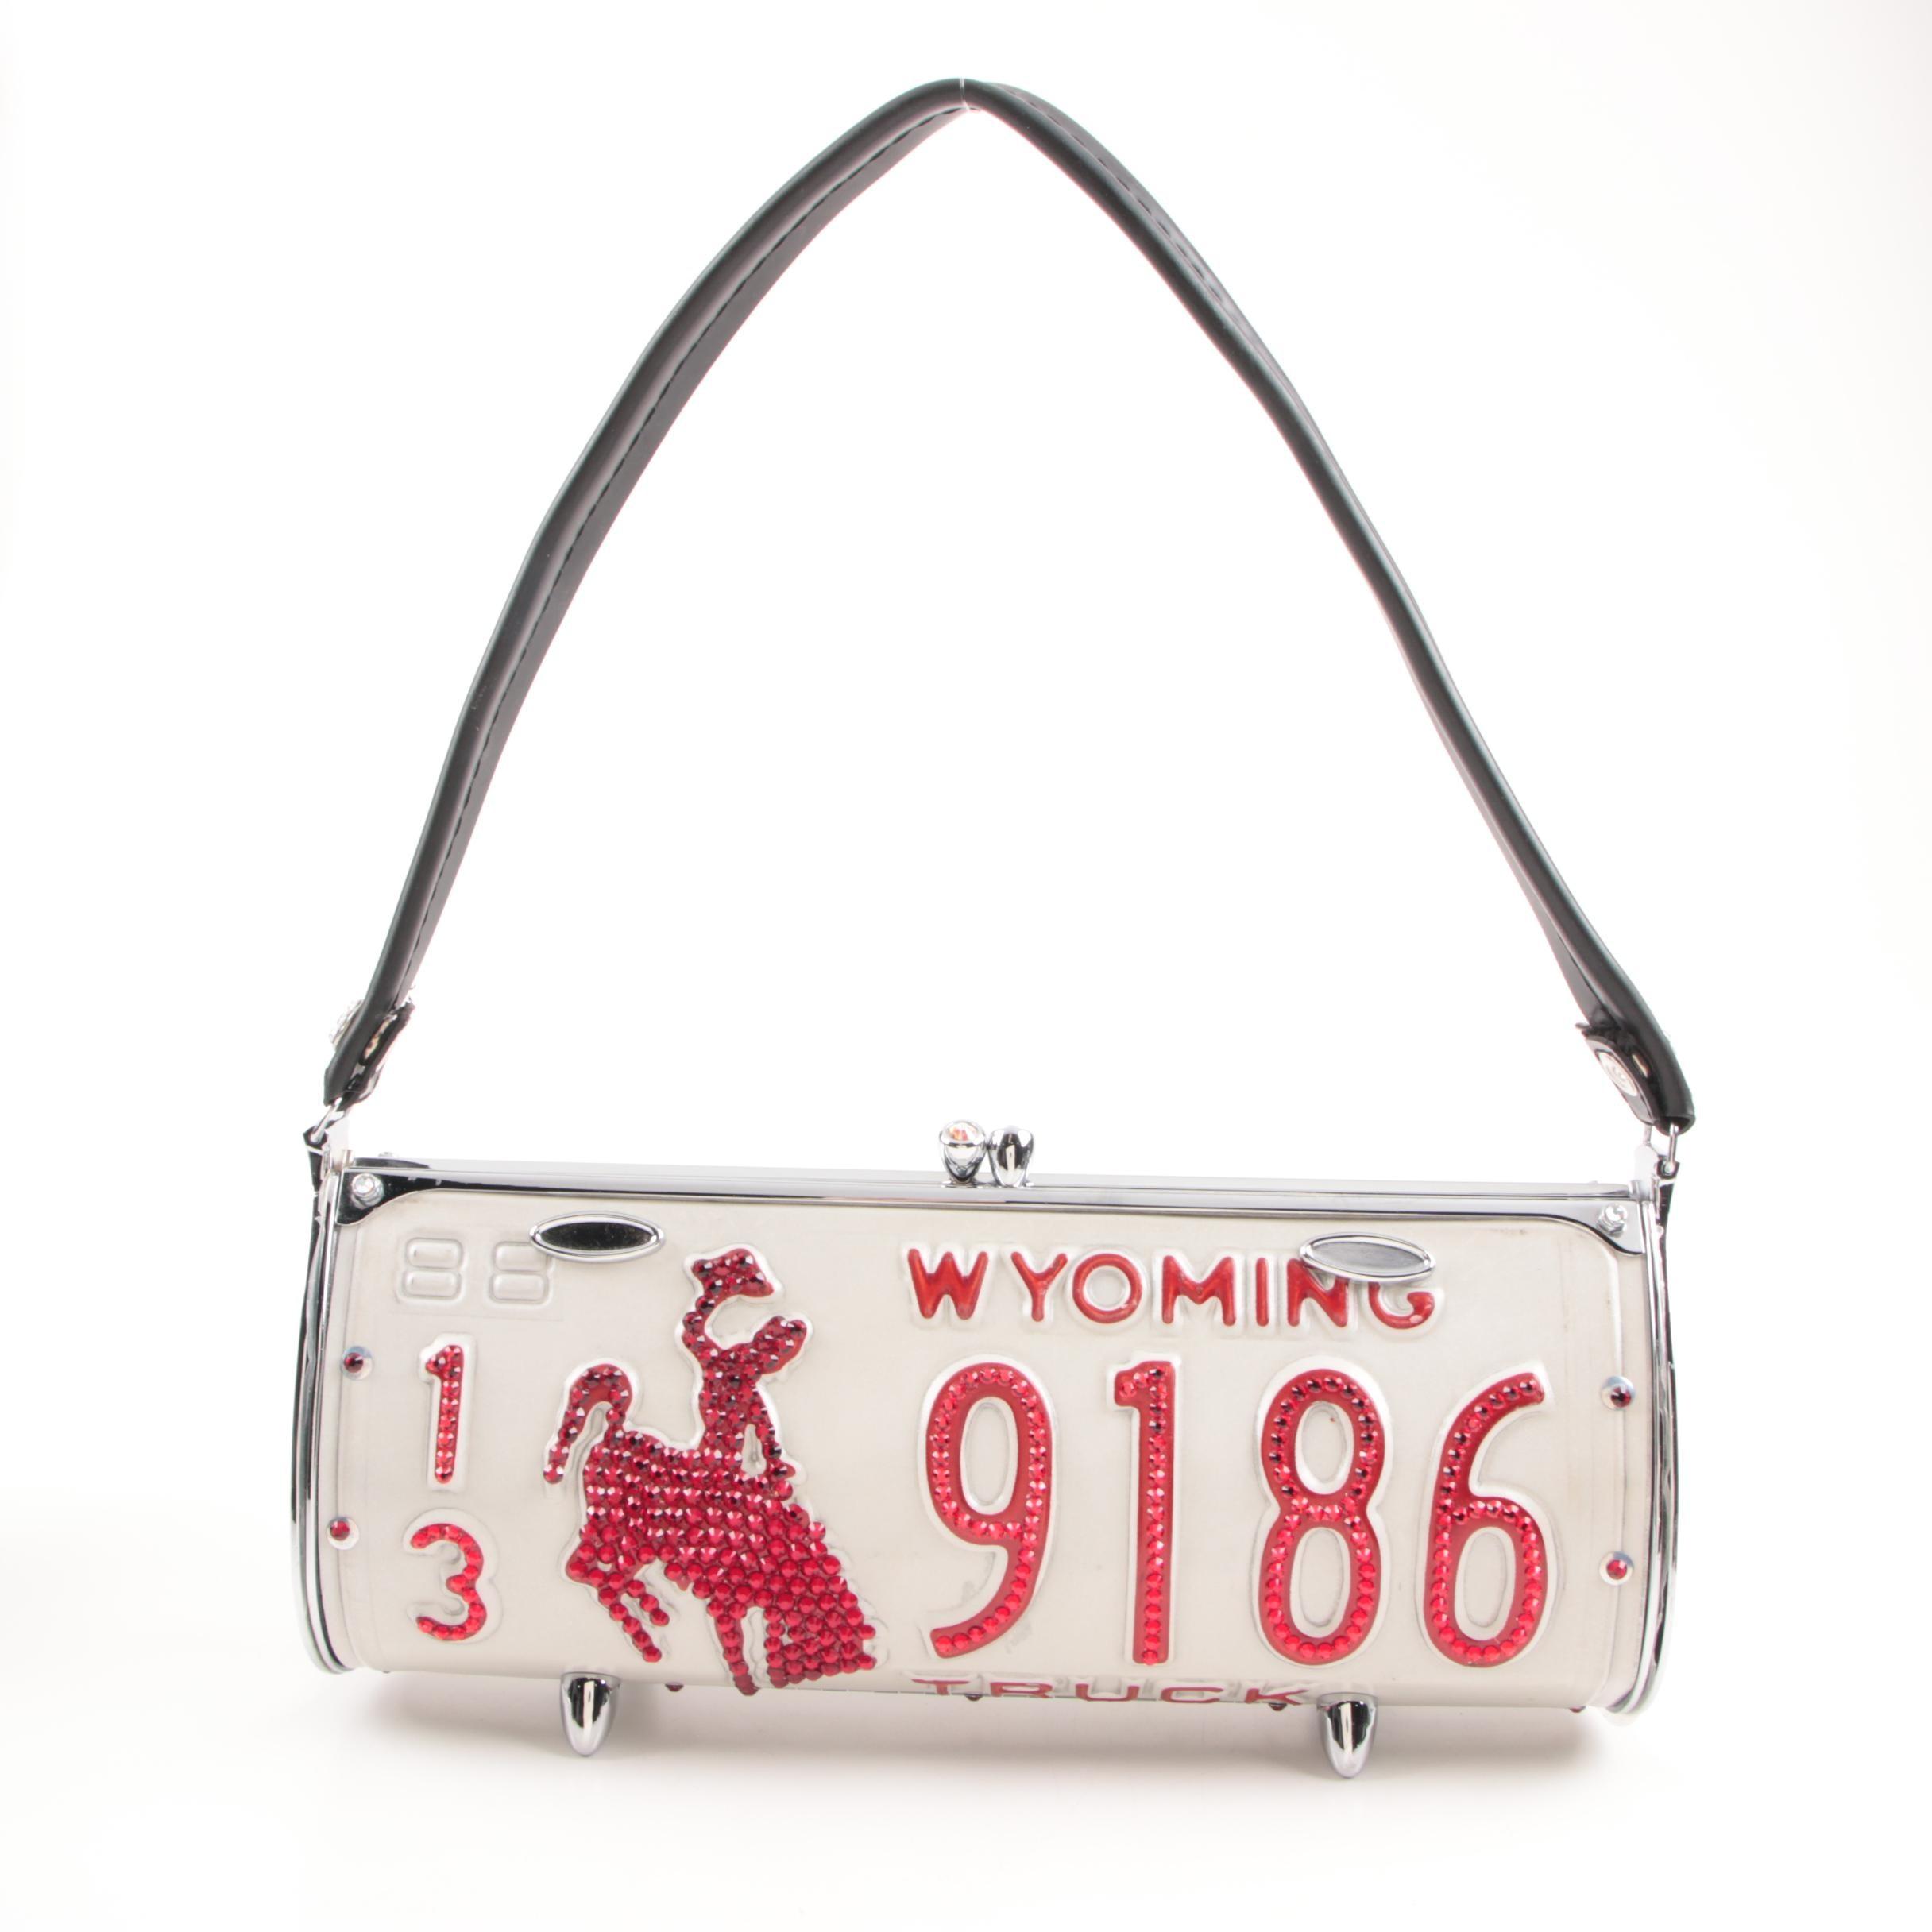 Littlearth RoadFlair License Plate Bag with Swarovski Crystal Embellishments